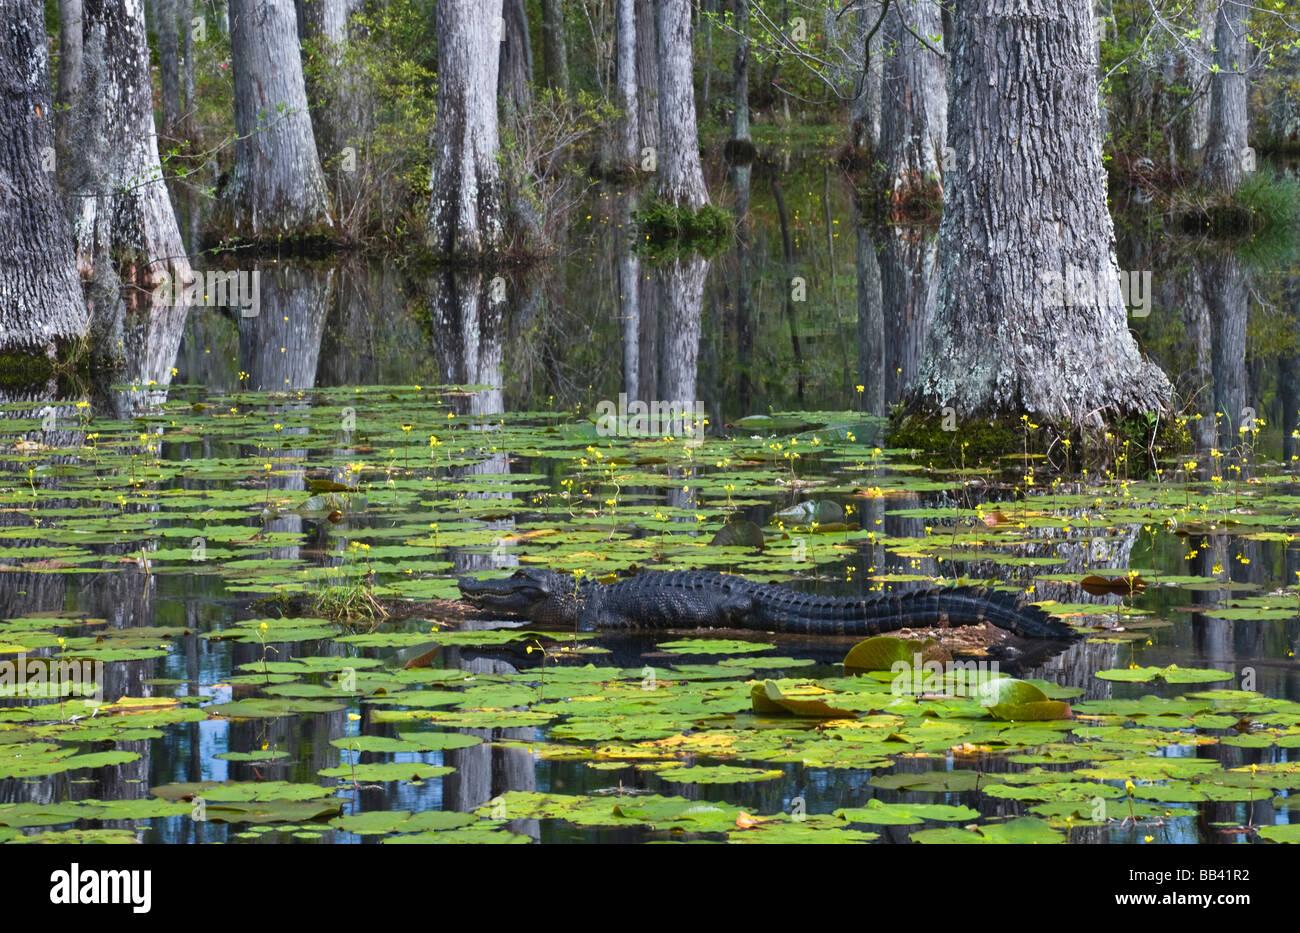 Usa South Carolina Cypress Gardens Alligator Rests On Log In Stock Photo 24060822 Alamy